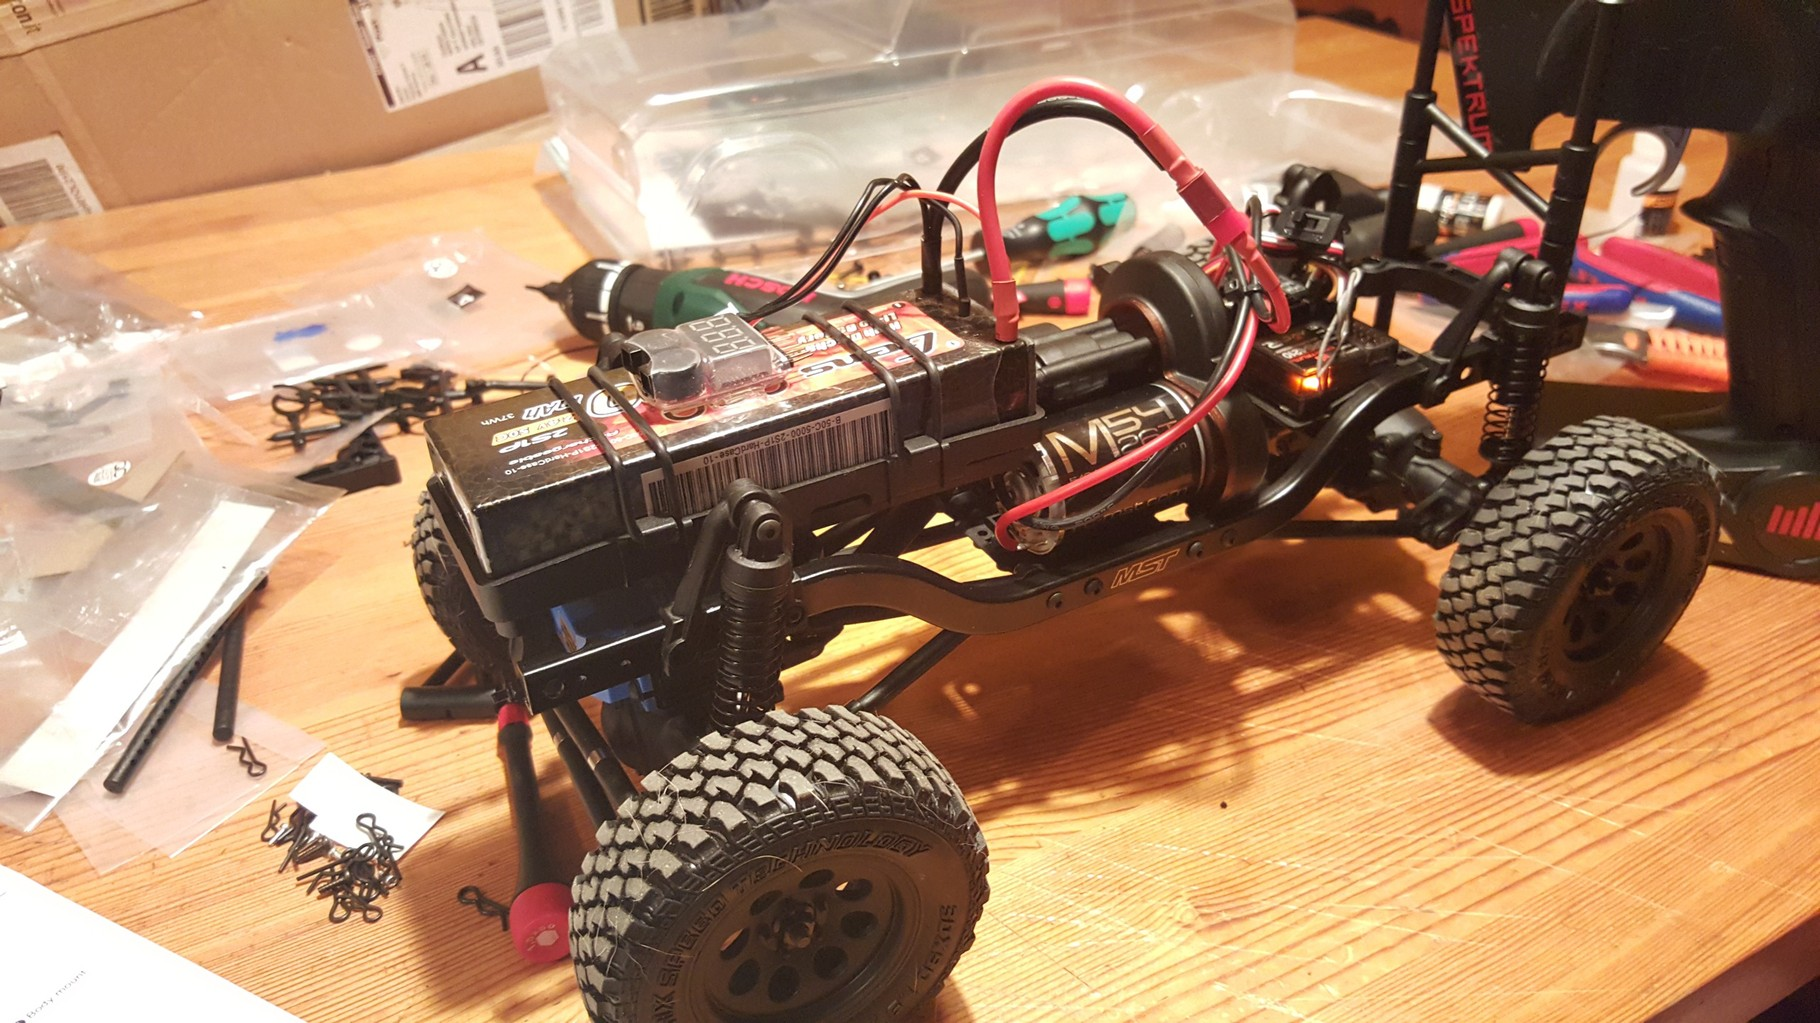 MST CMX - Fertig aufgebautes Chassis